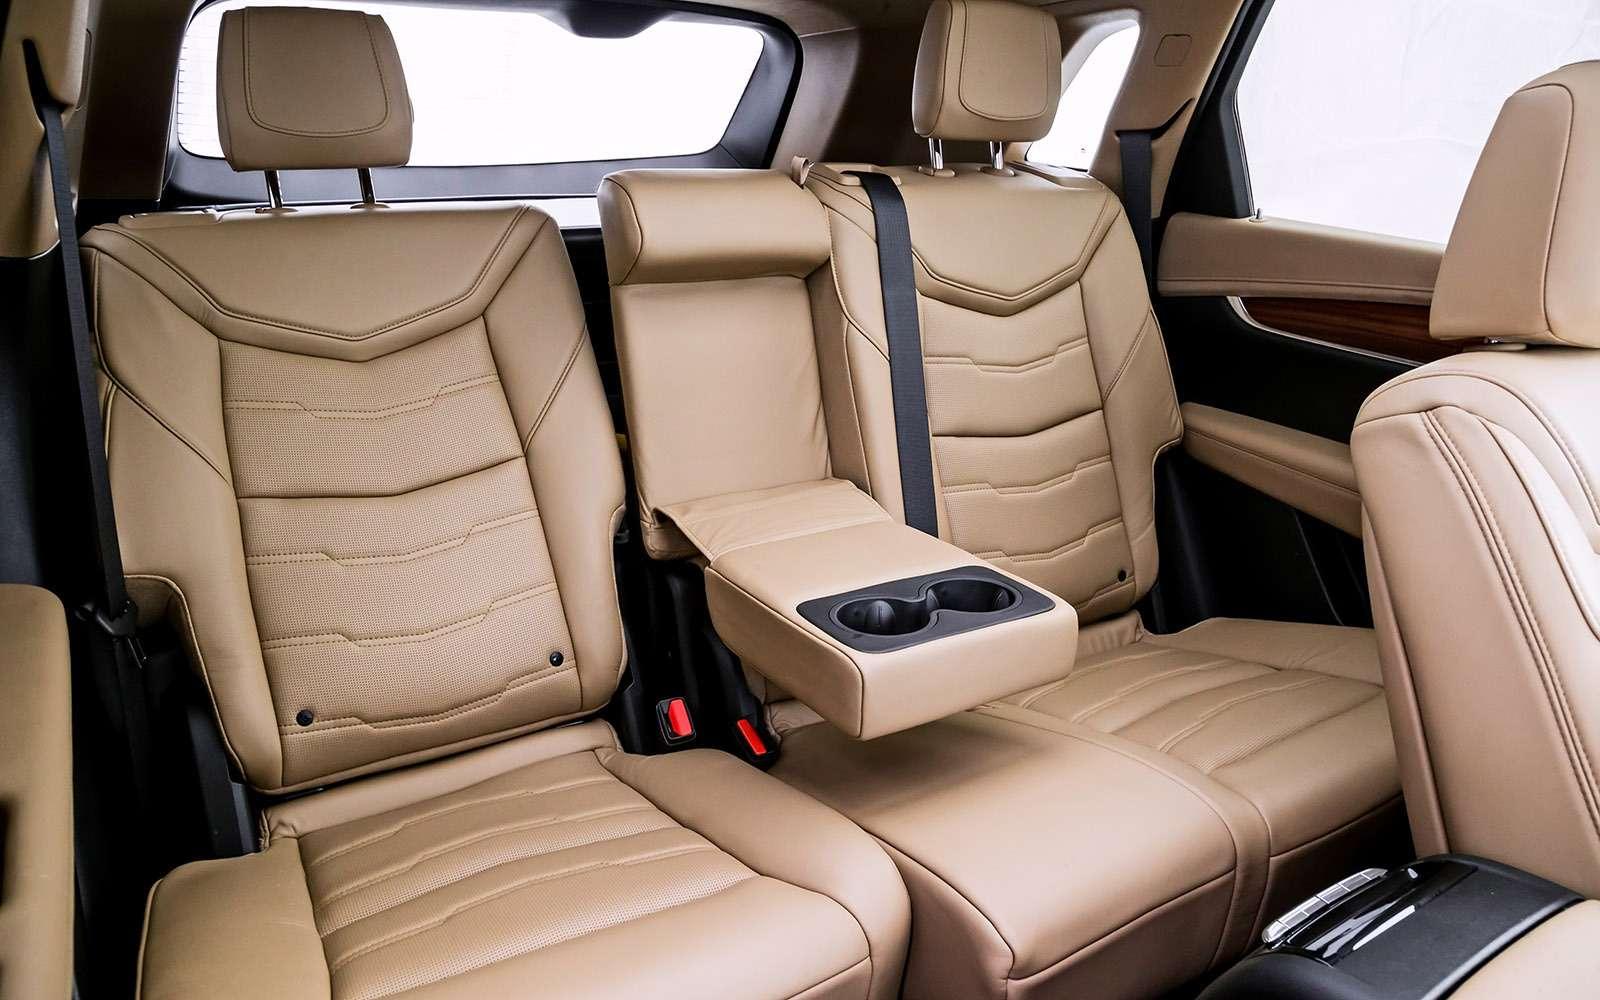 Тест премиум-кроссоверов: Lexus RX350, Cadillac XT5и Jaguar F-Pace— фото 721805